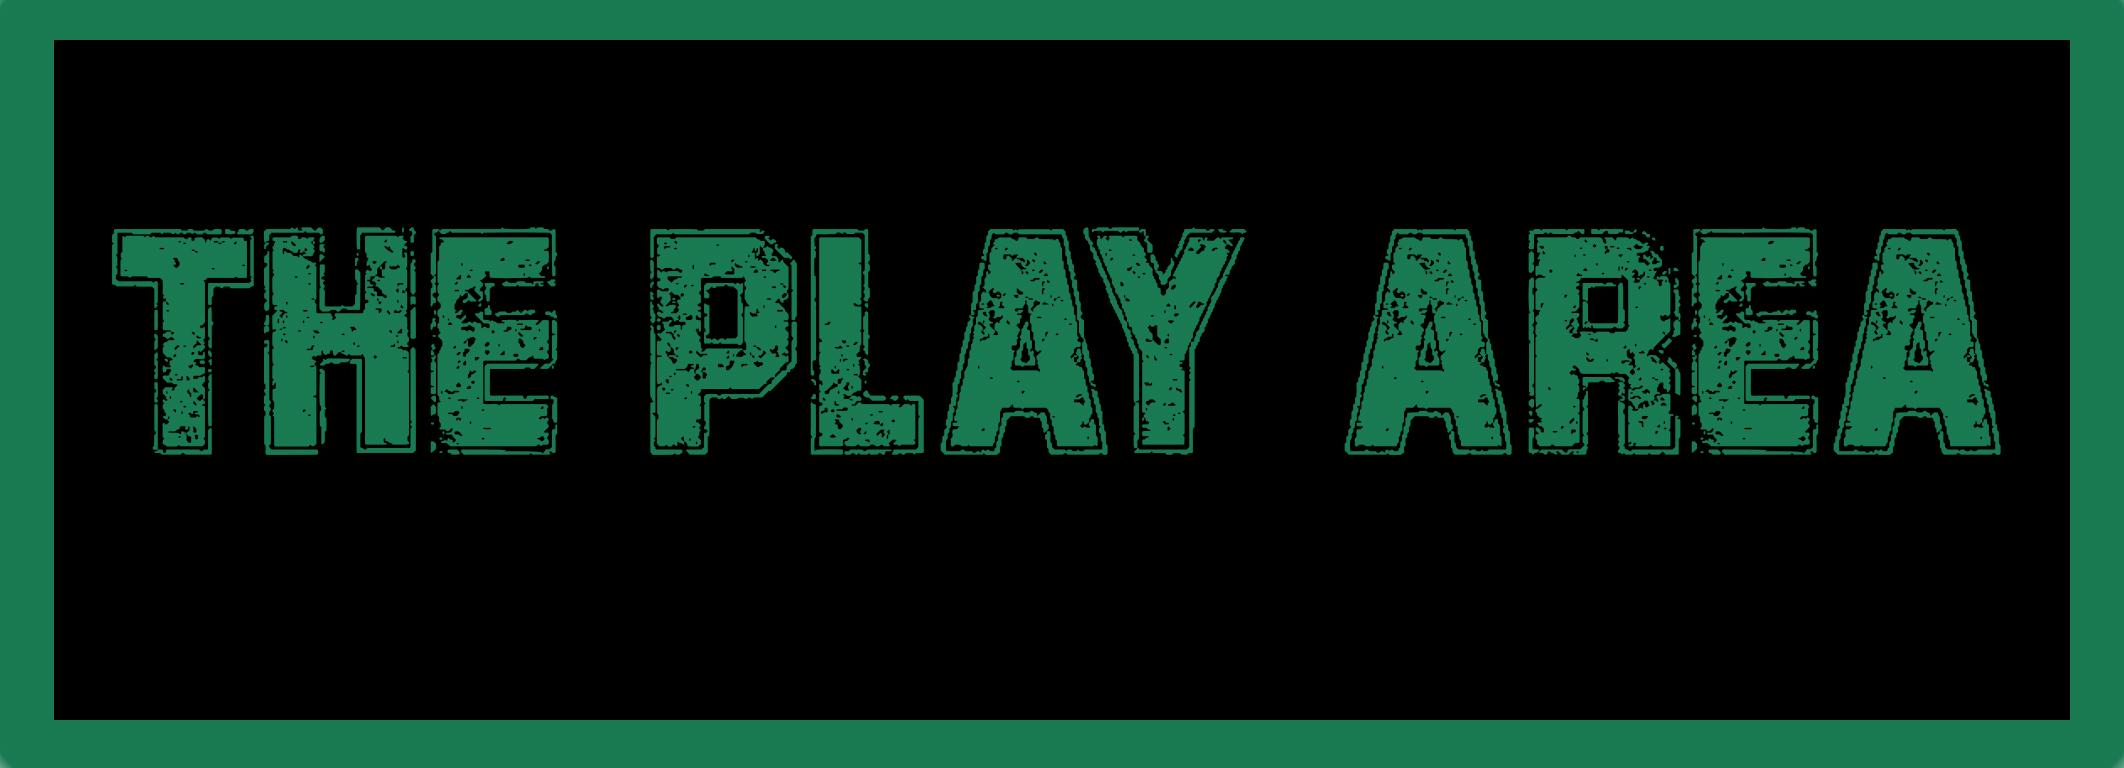 Play Area button.jpg